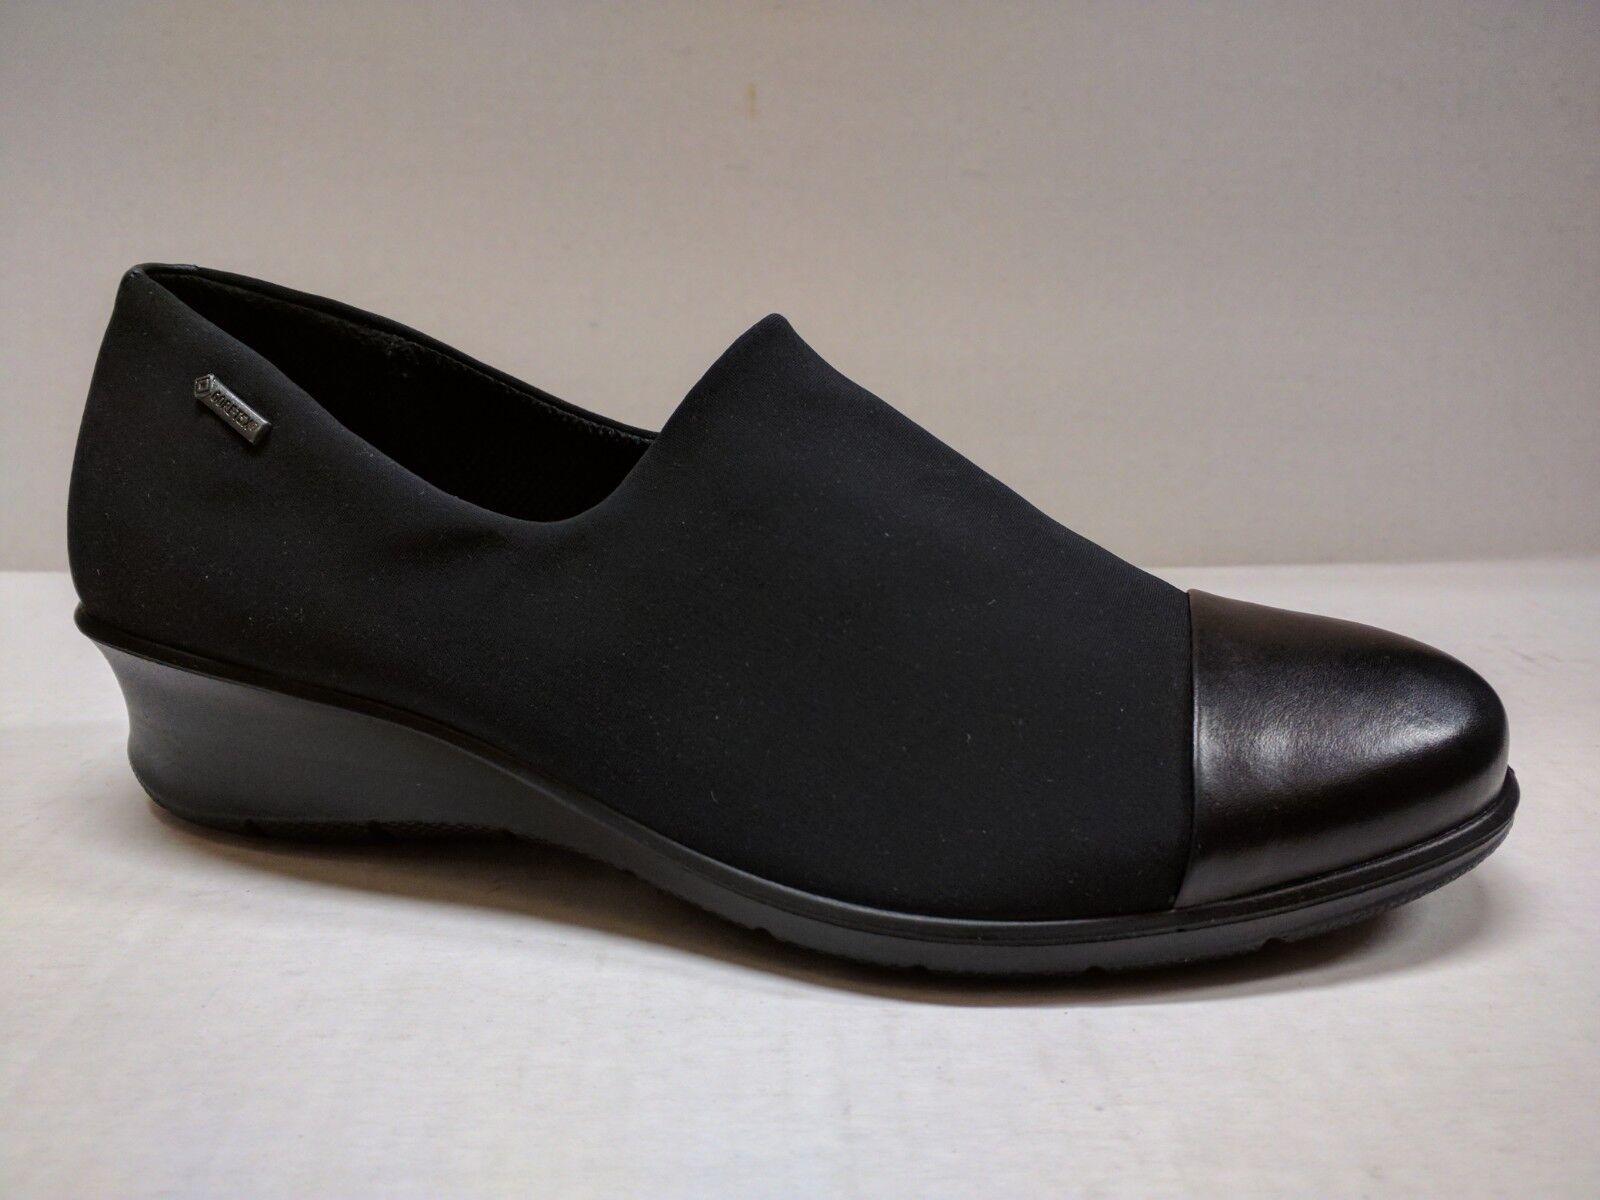 ECCO WOMEN'S FELICIA WATERPROOF GORE-TEX WEDGE SLIP-ON SHOE